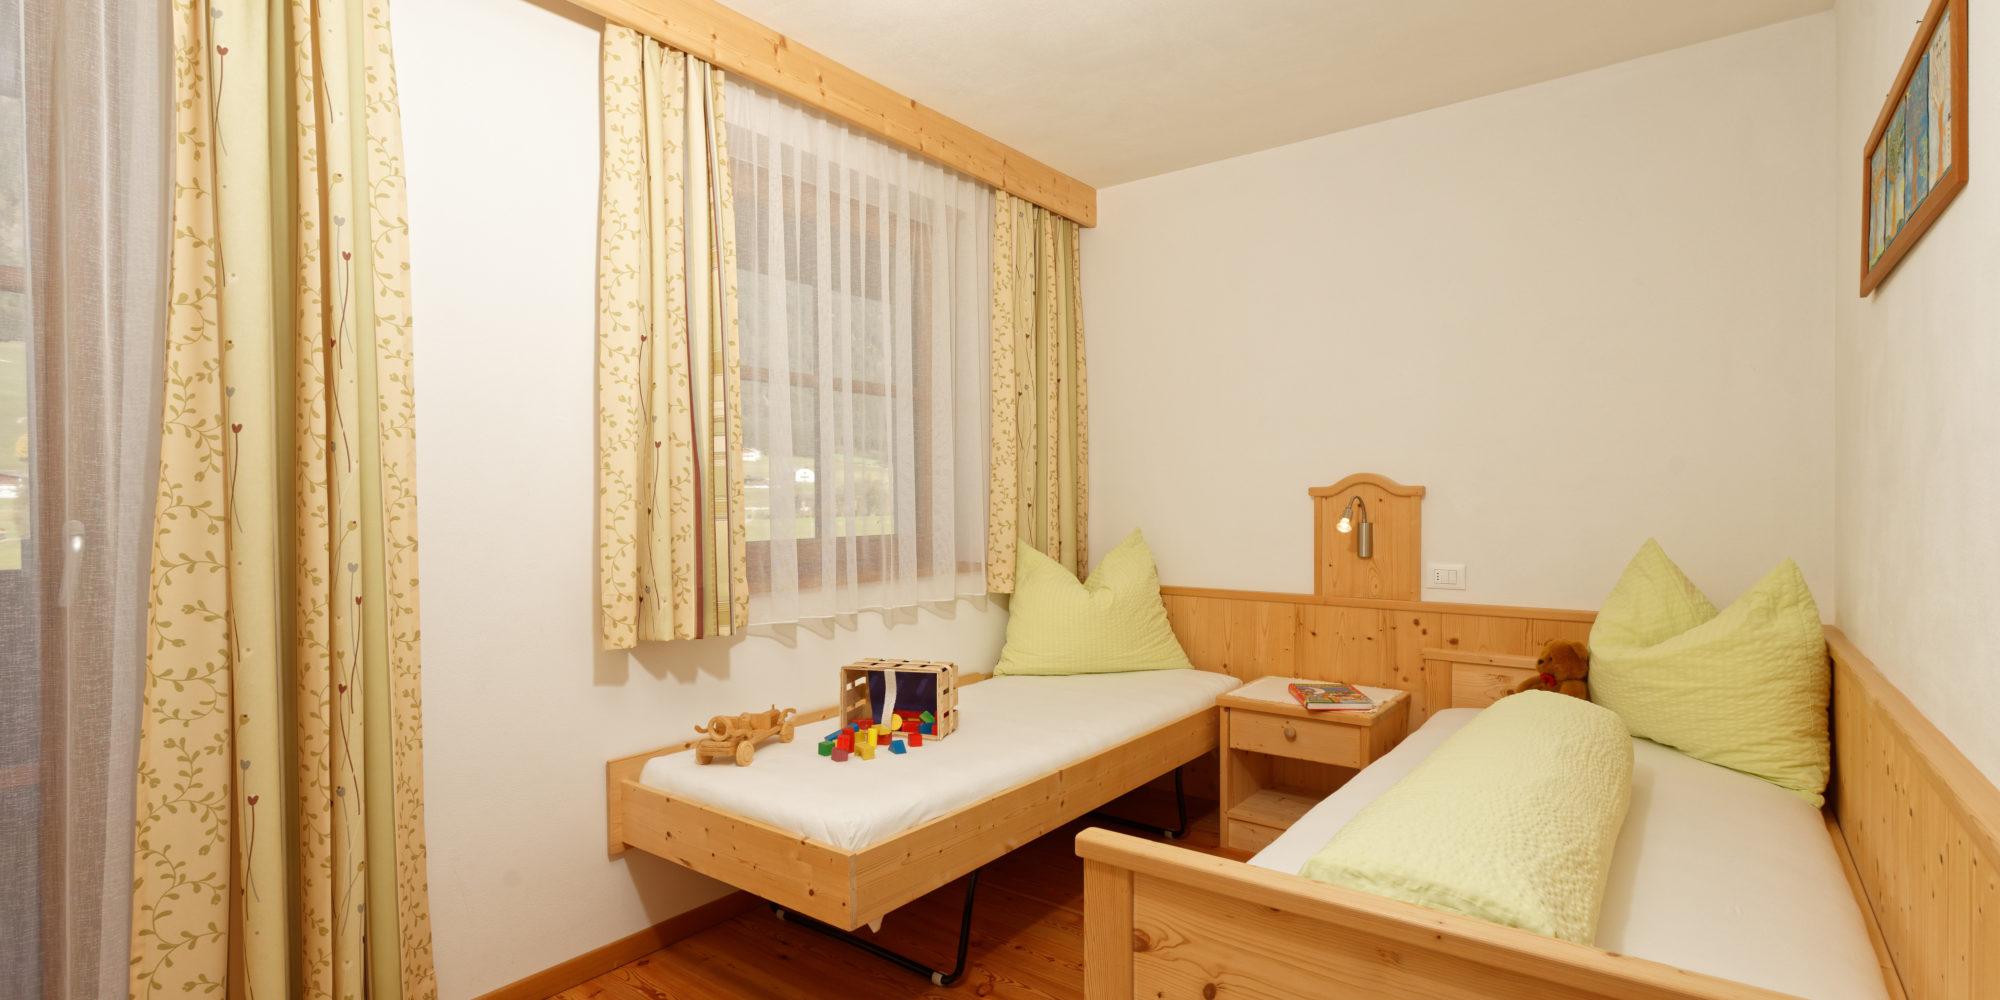 Abendrot Kinderzimmer 01